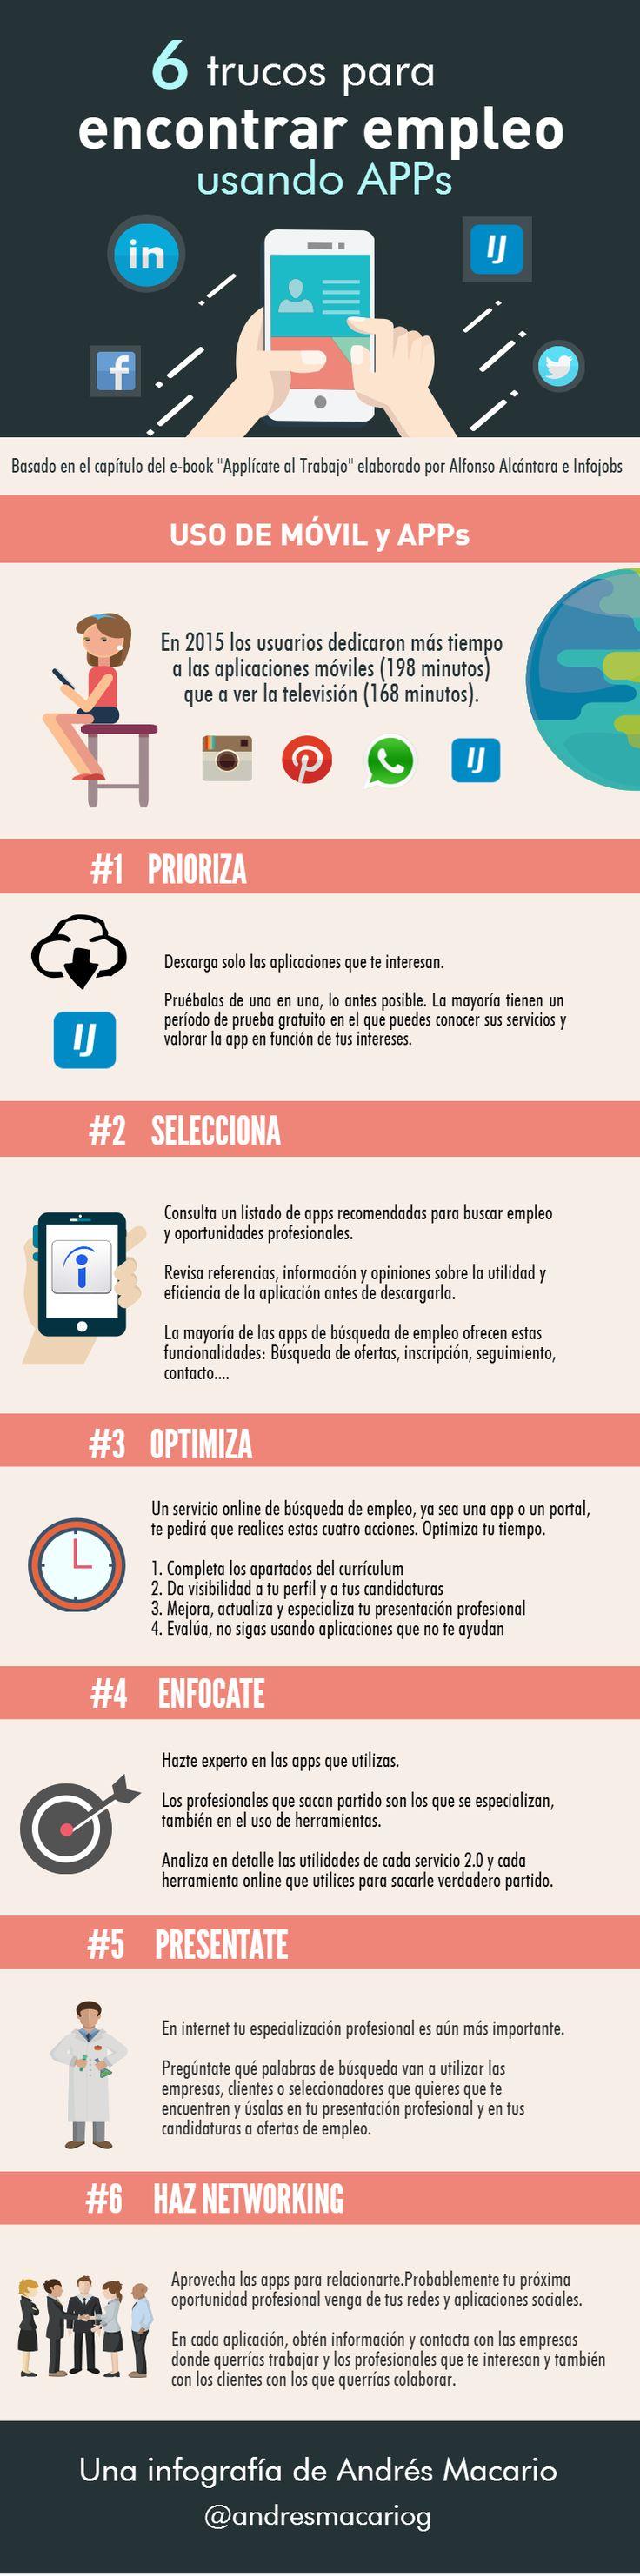 6 trucos para encontrar empleo con apps - #Infografia Andres Macario